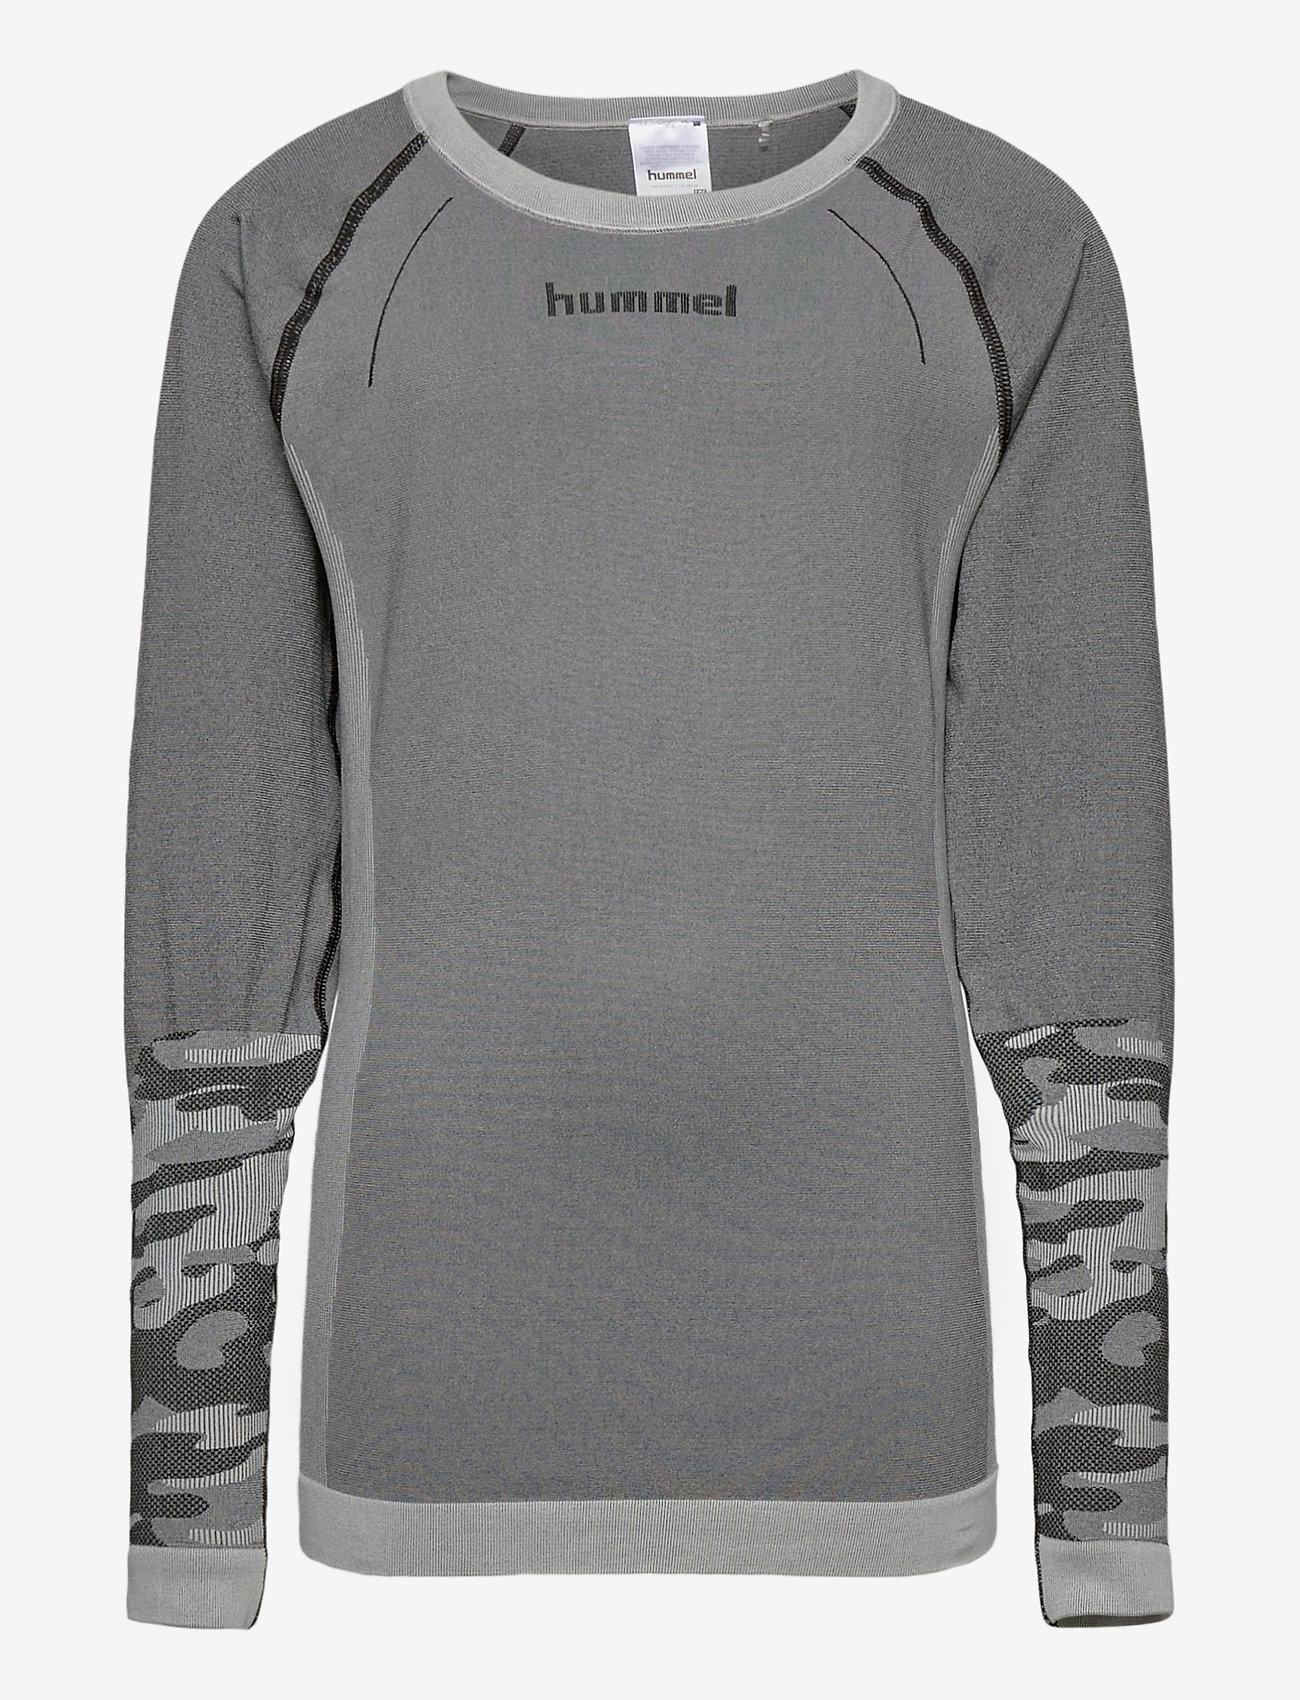 Hummel - hmlMAX SEAMLESS T-SHIRT L/S - long-sleeved t-shirts - medium melange - 0